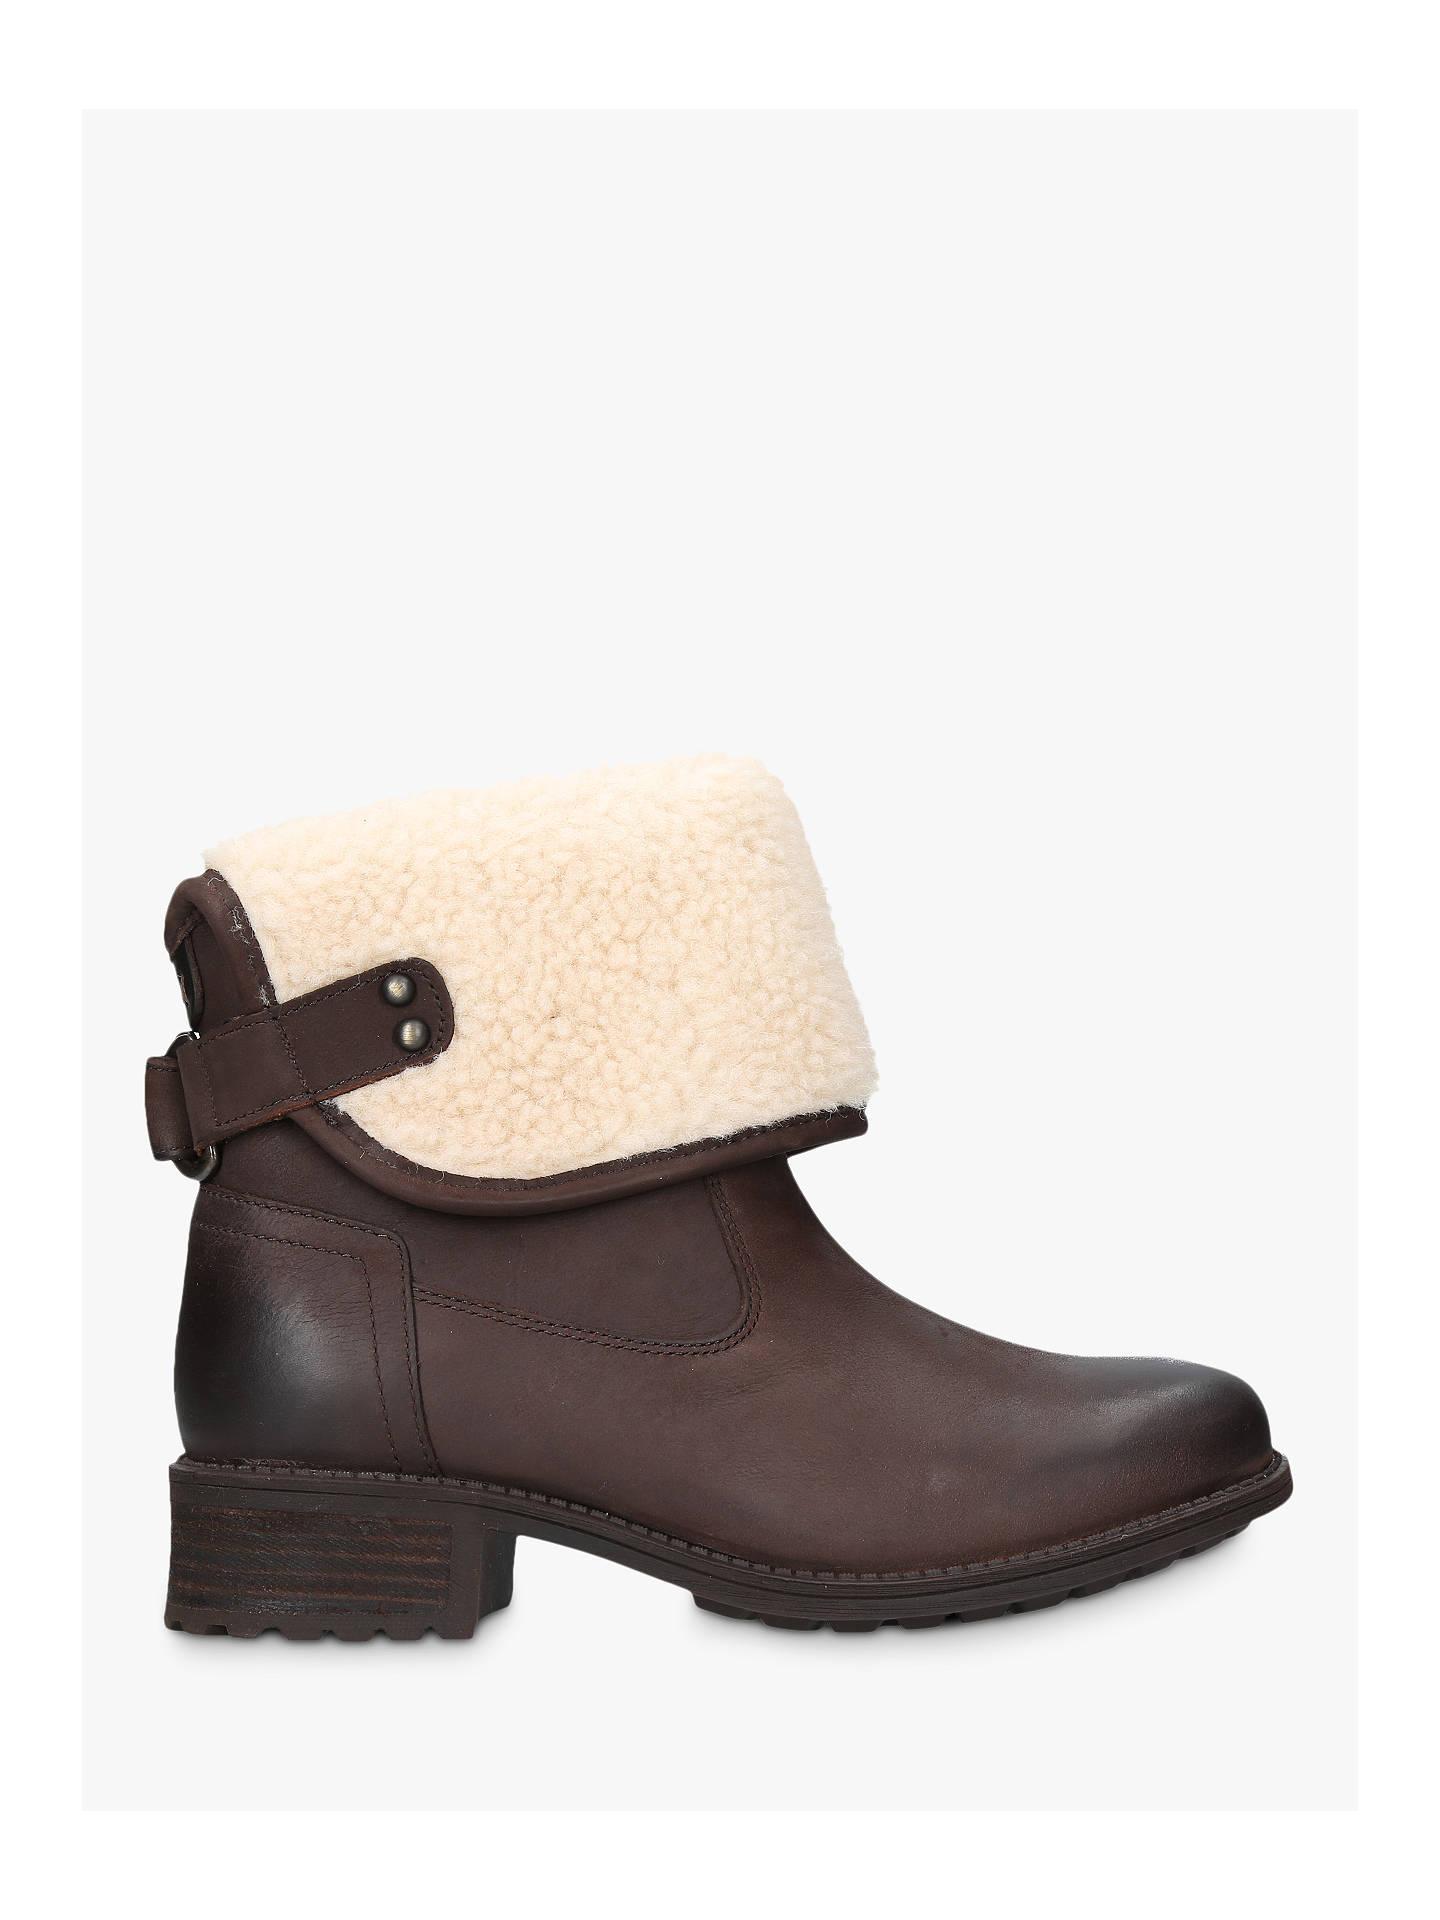 8e4852a5393 UGG Aldon Foldover Boots at John Lewis & Partners